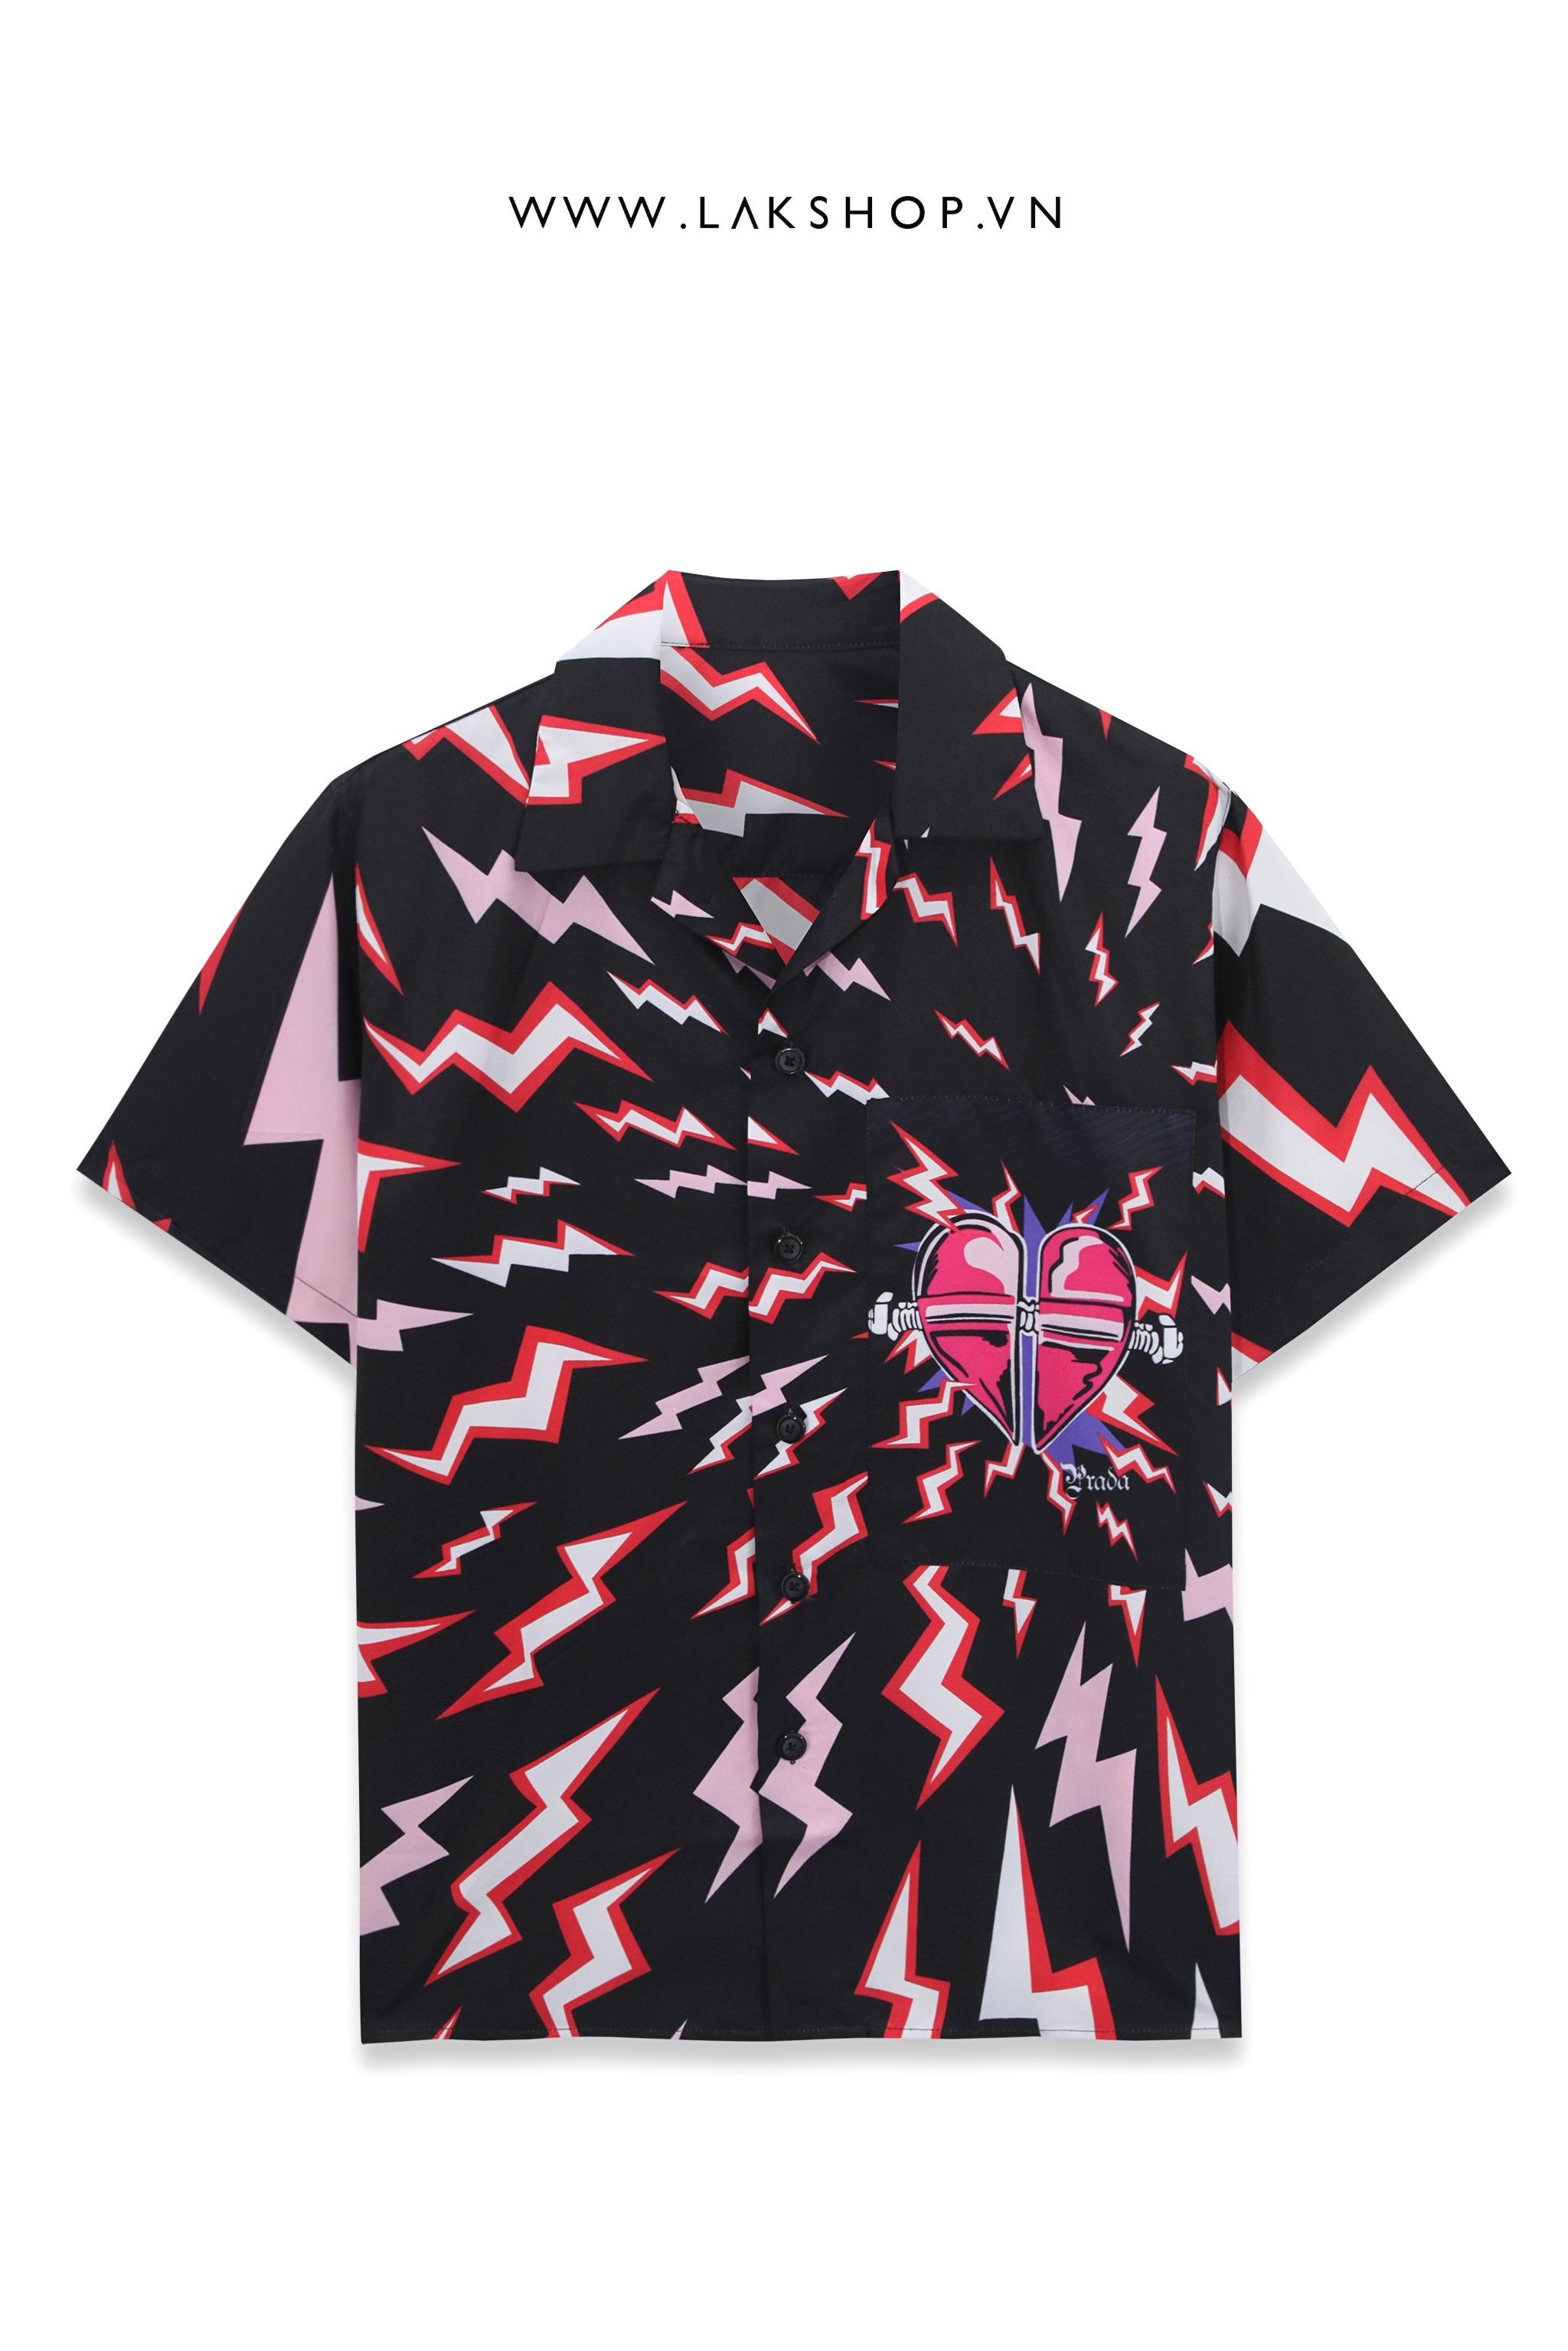 Prada Lightning Bolt Oversized Shirt cv3